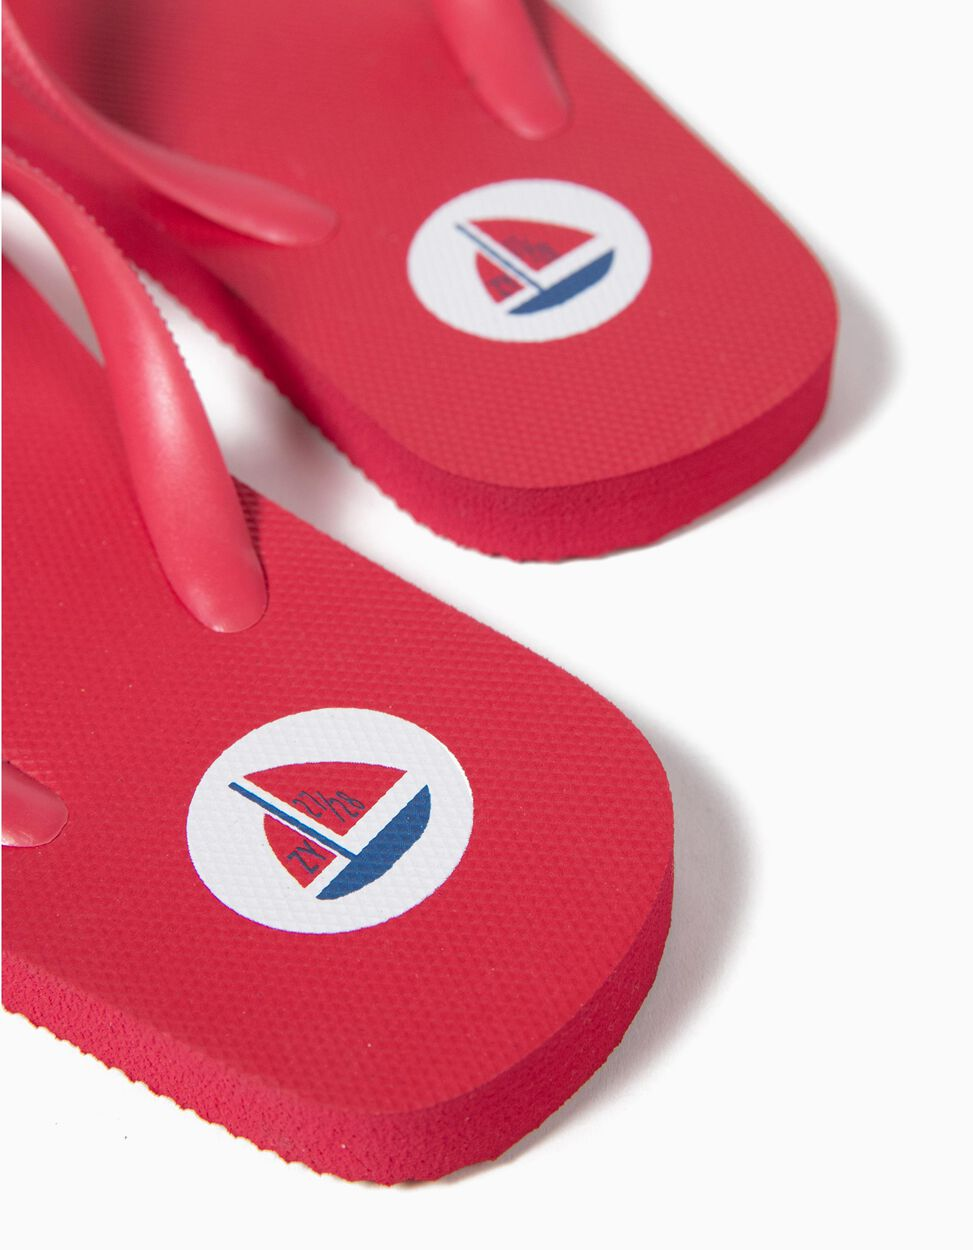 Sandalias de Playa Edición Especial BS